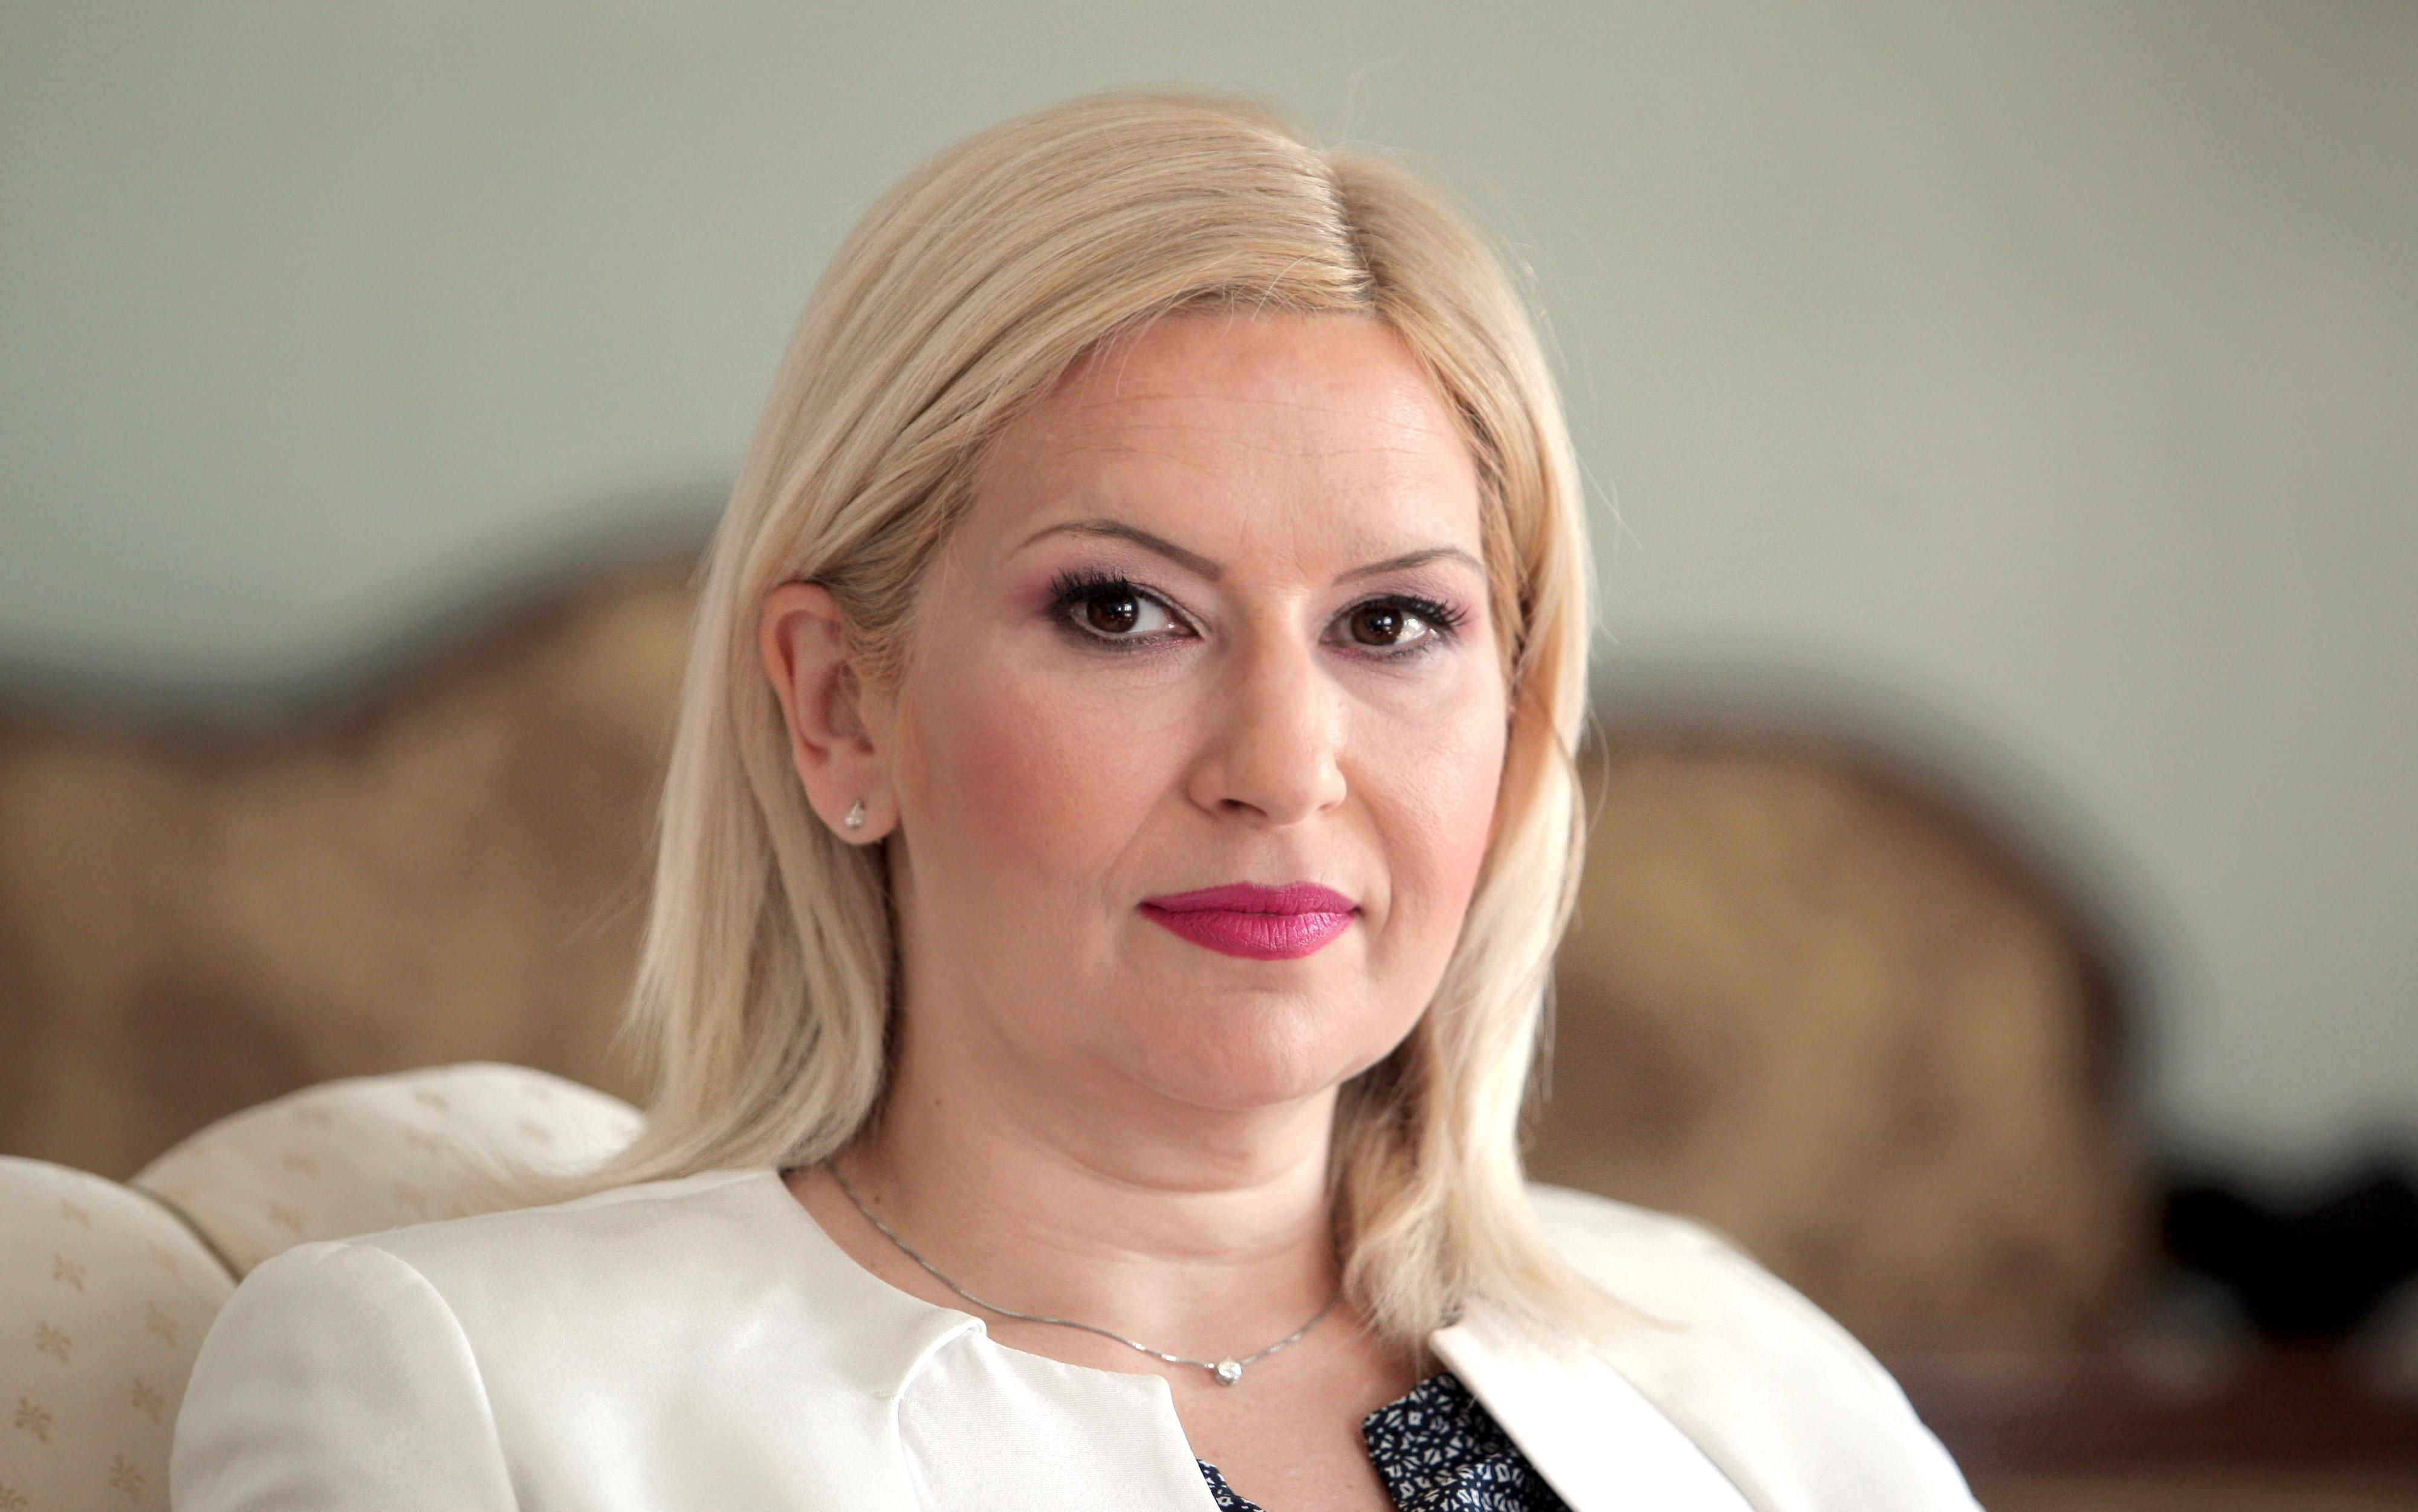 Mihajlovic denies ambition to run for president